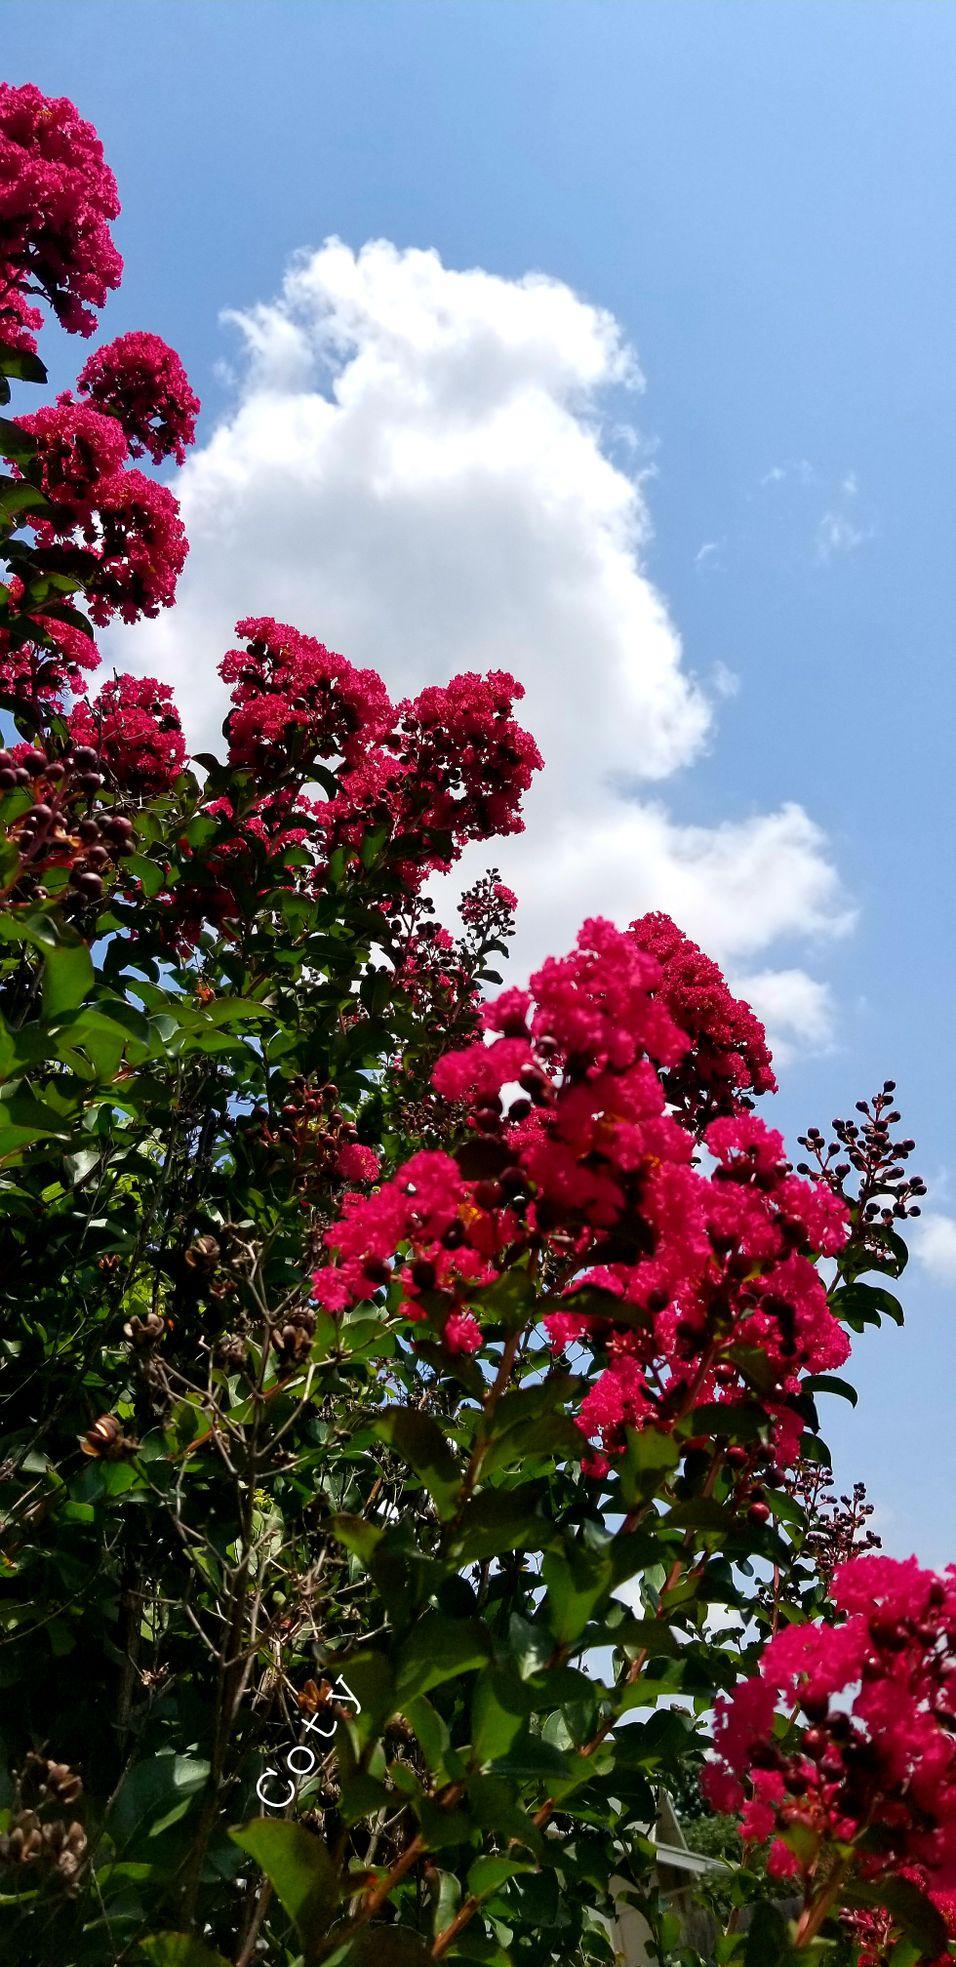 Sky and flowers 20210729_013622.jpg